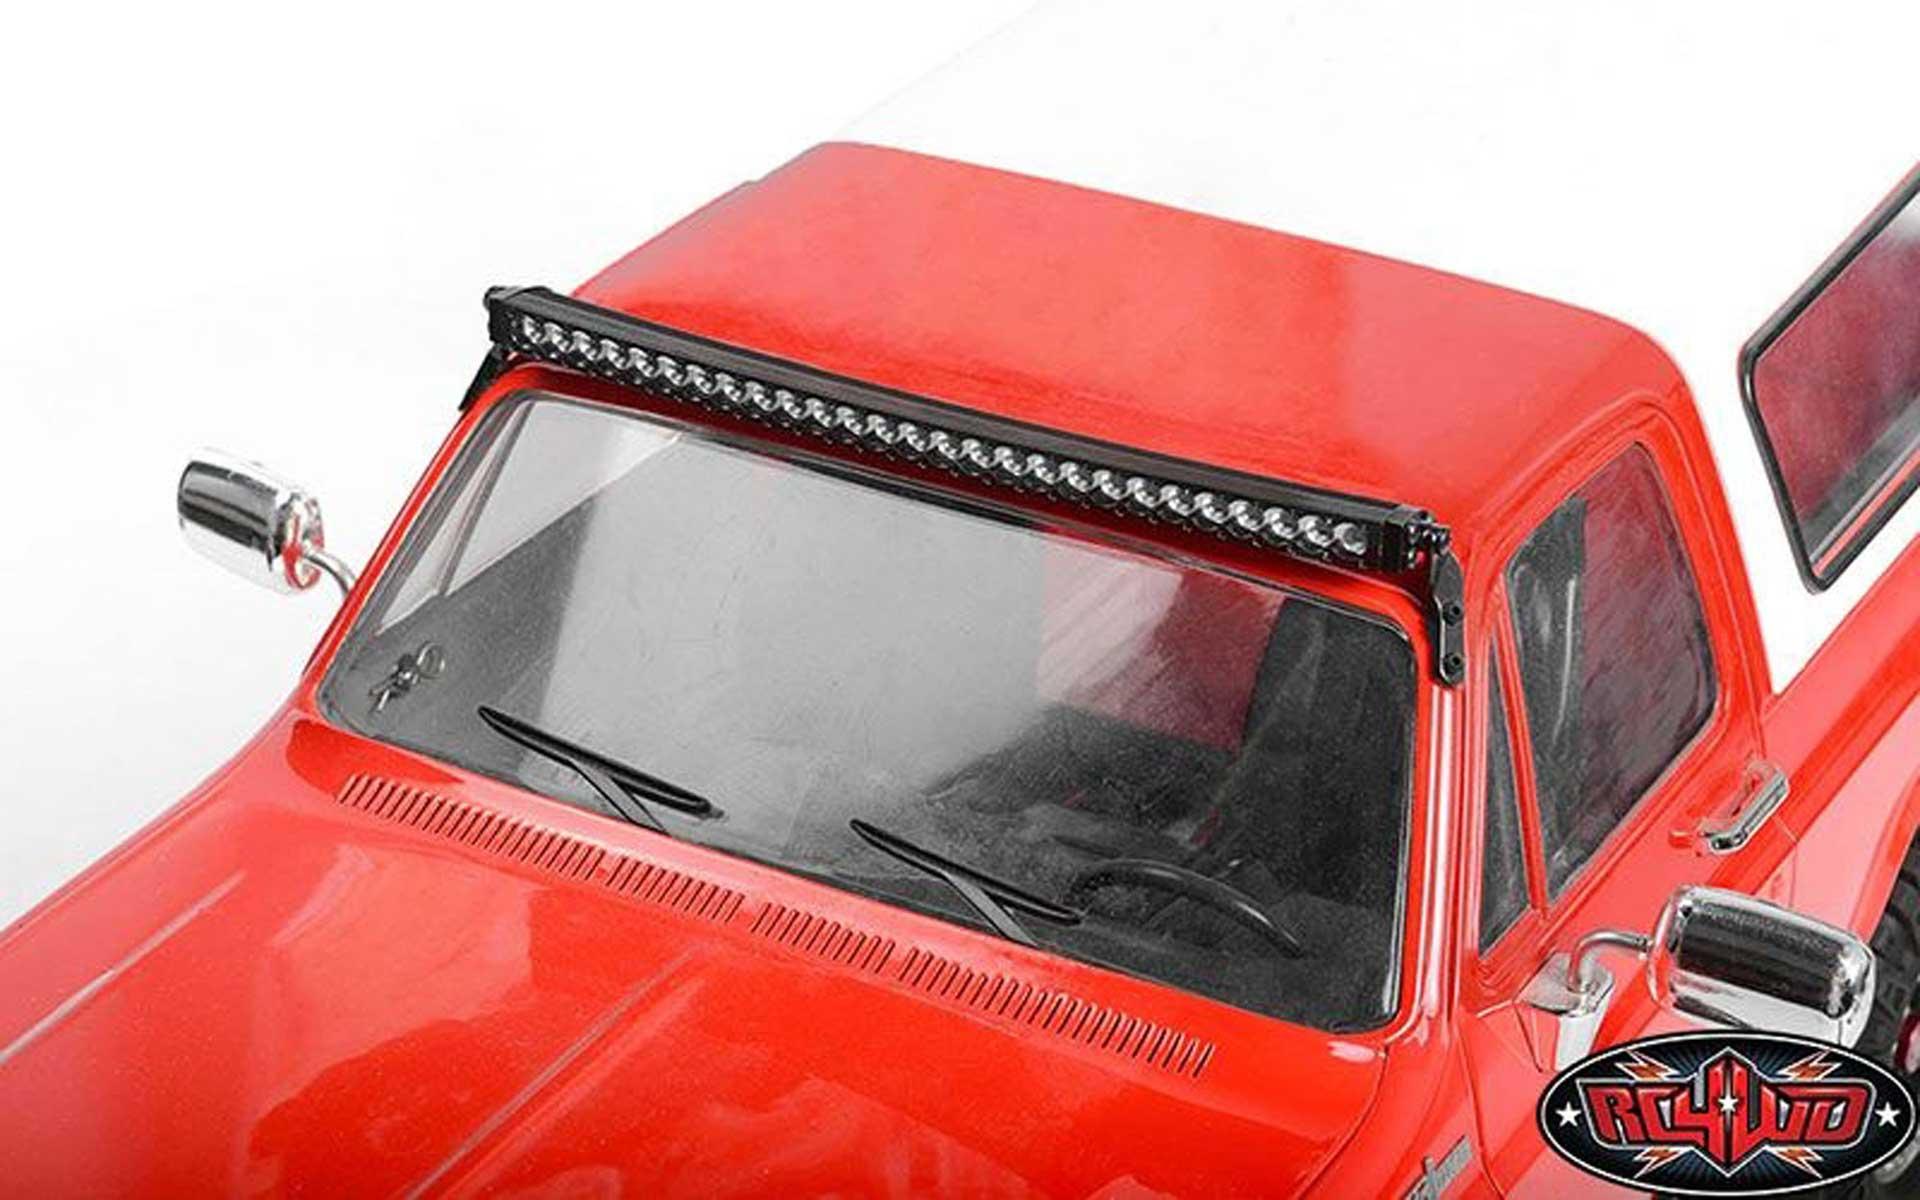 RC4WD BAJA DESIGNS ARC Lightbar for Chrevrolet Blazer